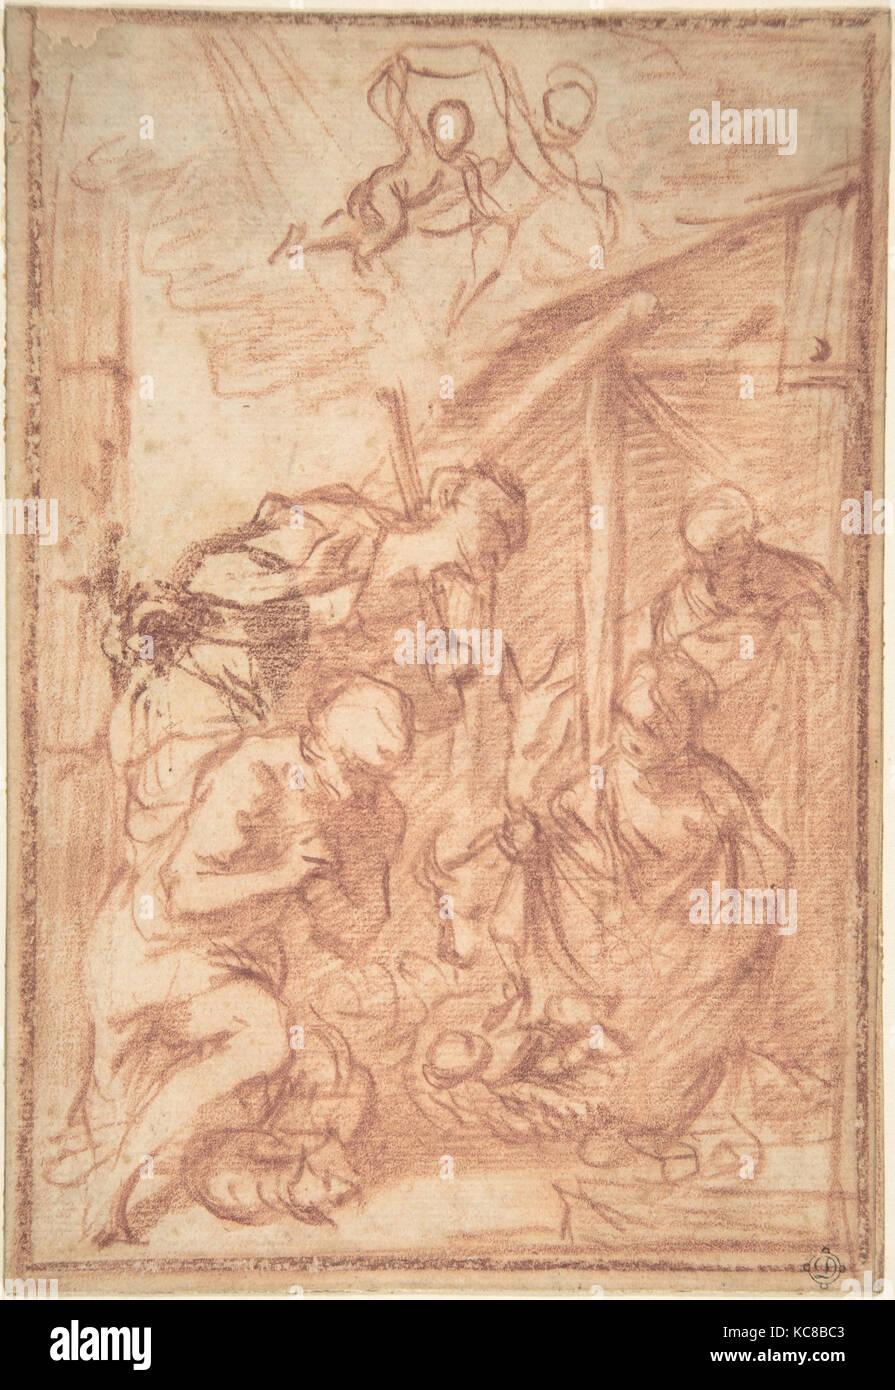 Adoration of the Shepherds, Francisco Vieira de Mattos, 1699–1783 - Stock Image